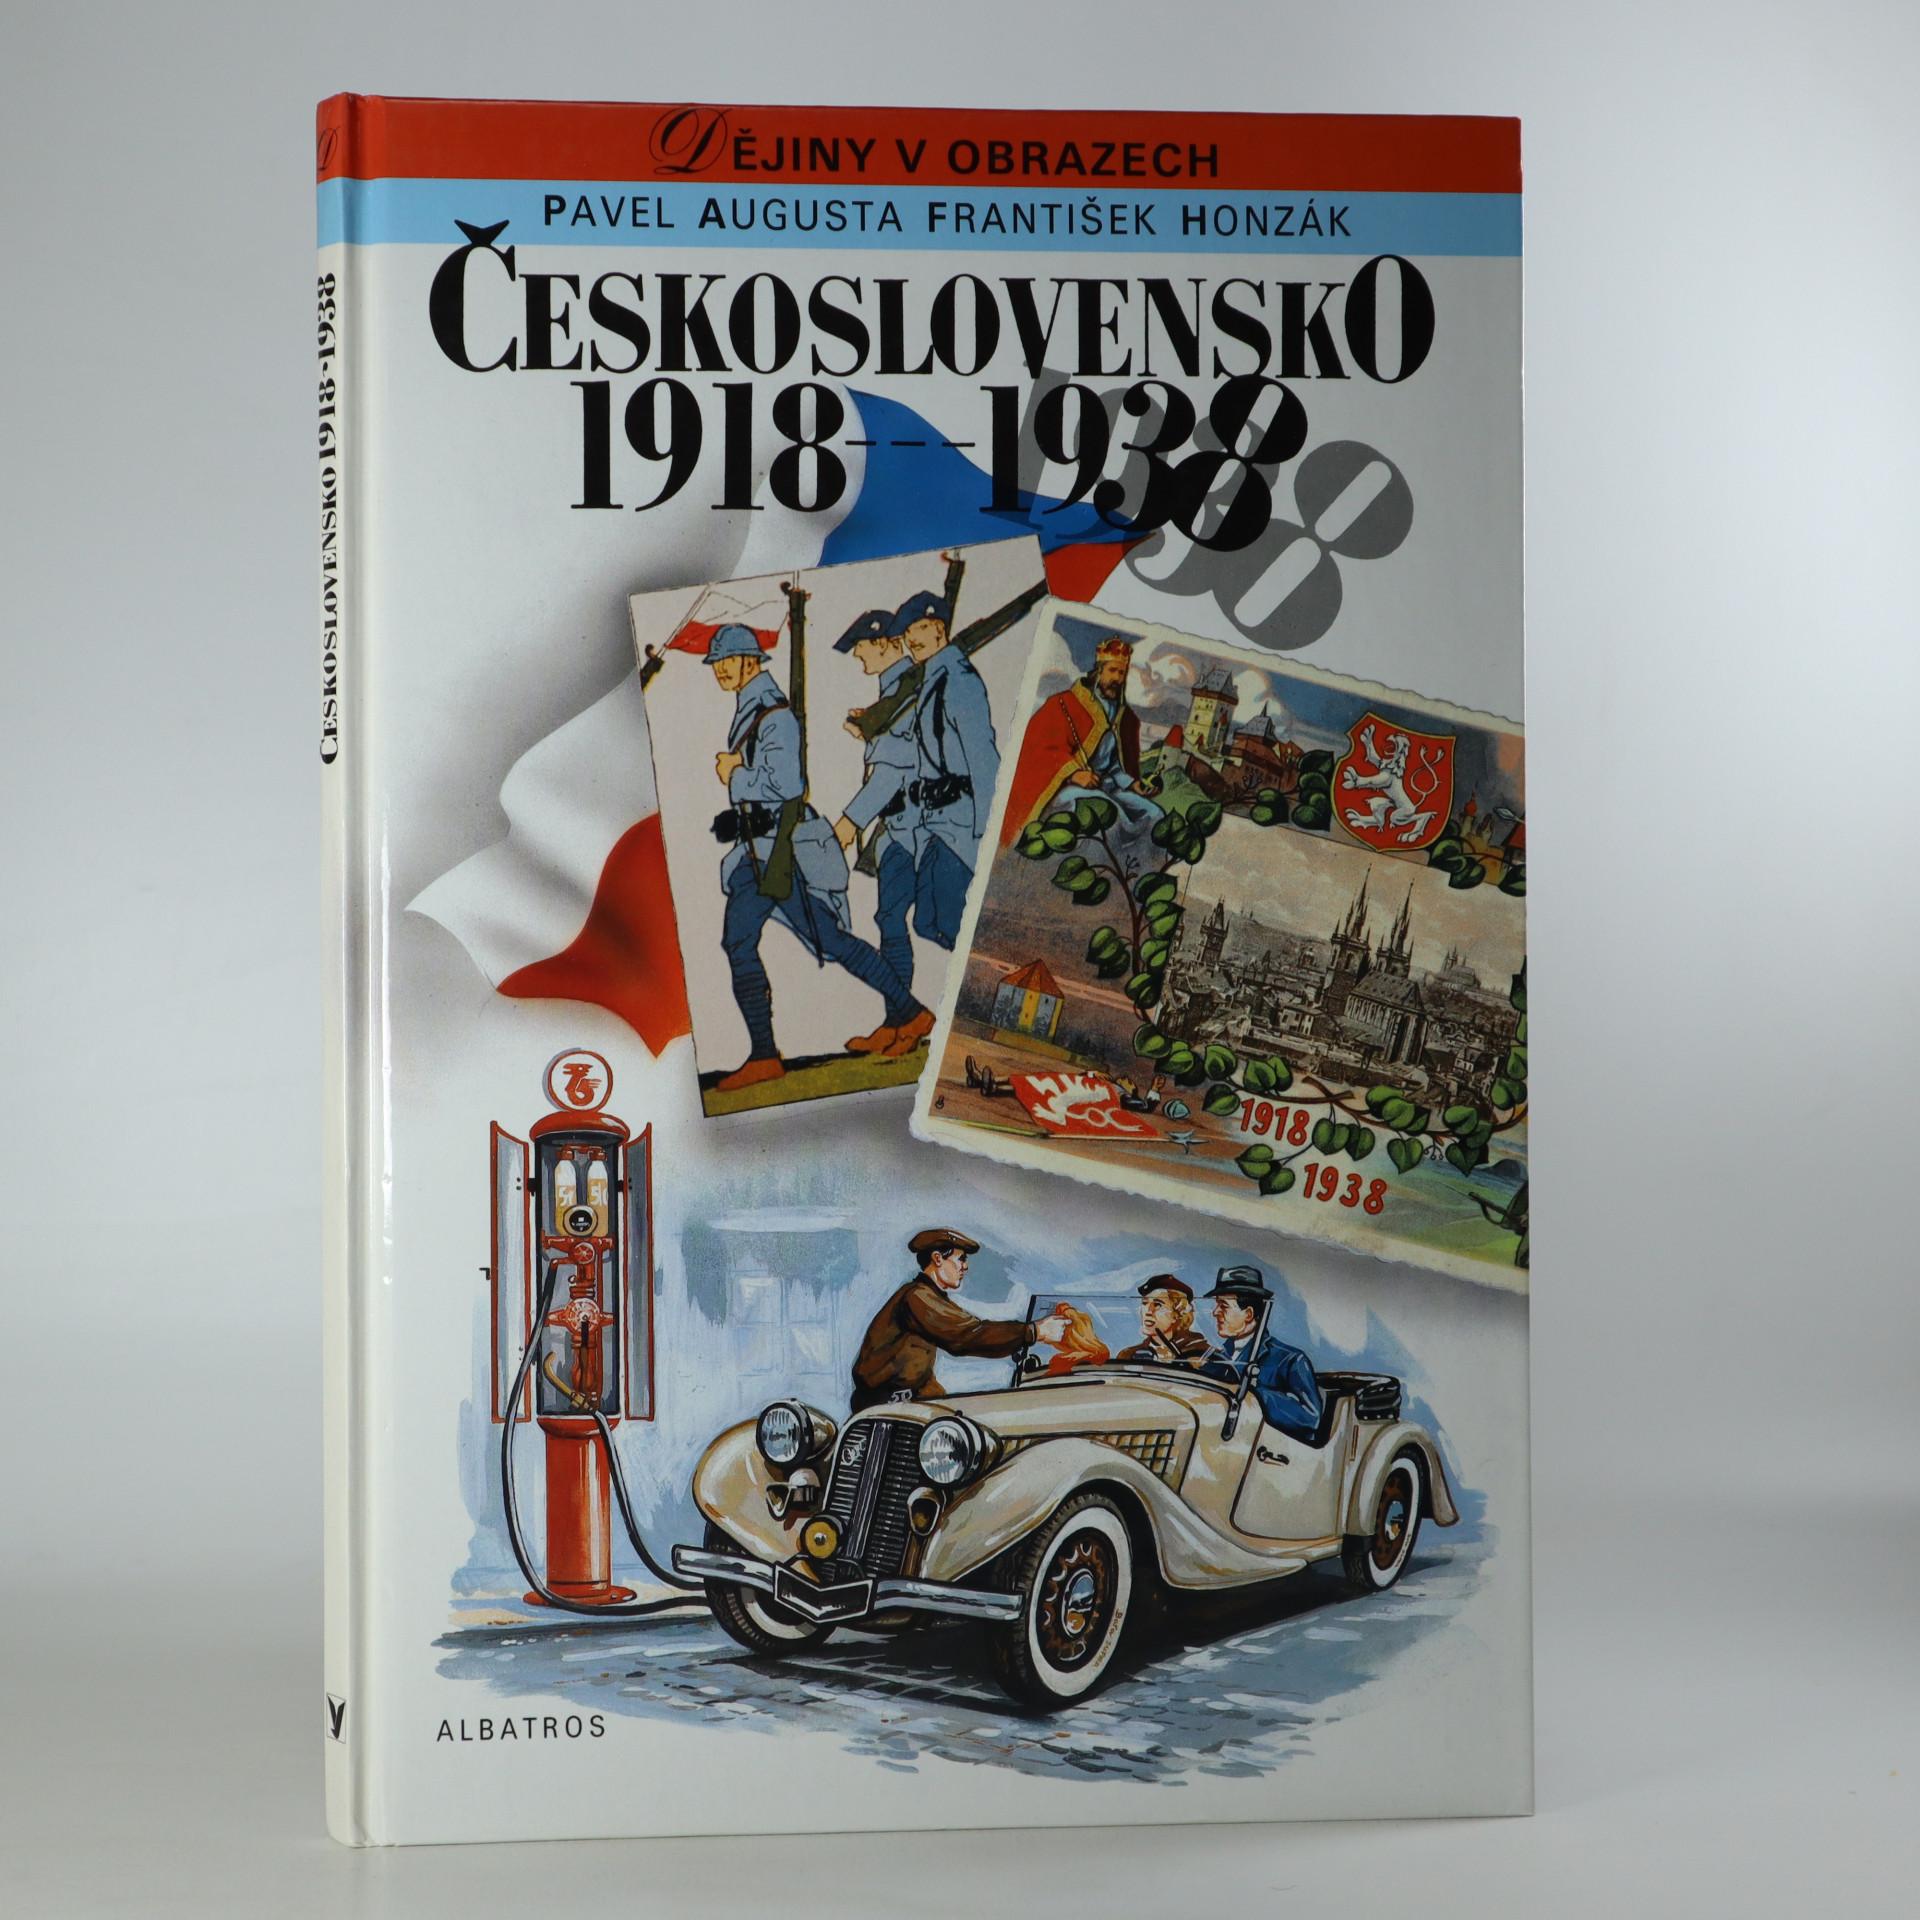 antikvární kniha Československo 1918-1938, 1992